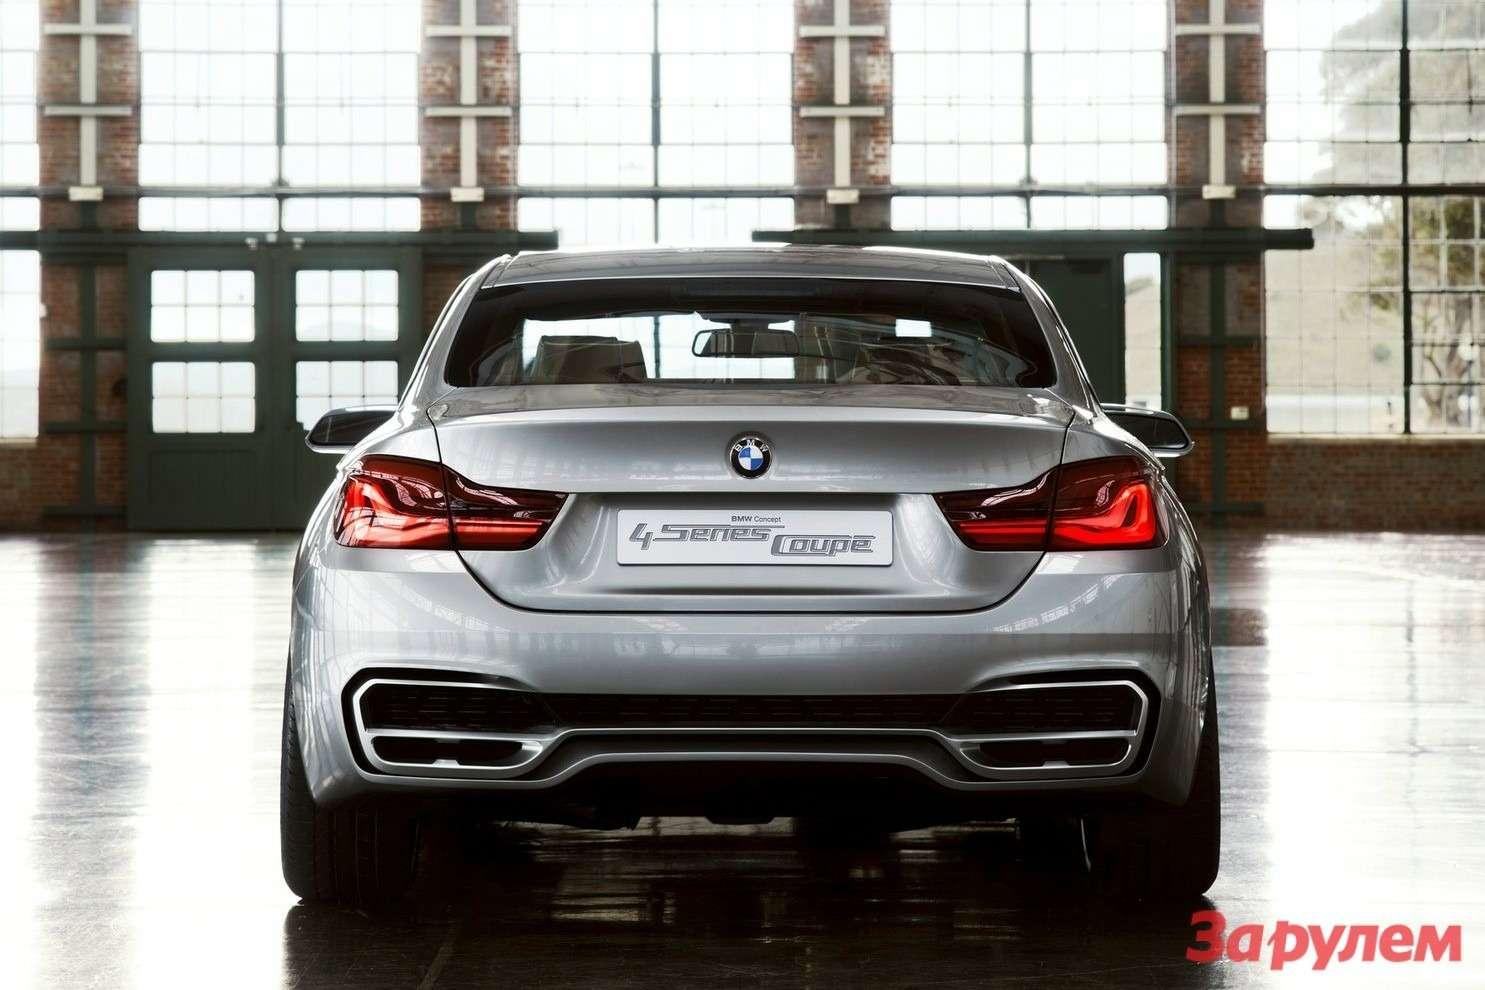 BMW-4-Series_Coupe_Concept_2013_1600x1200_wallpaper_1a